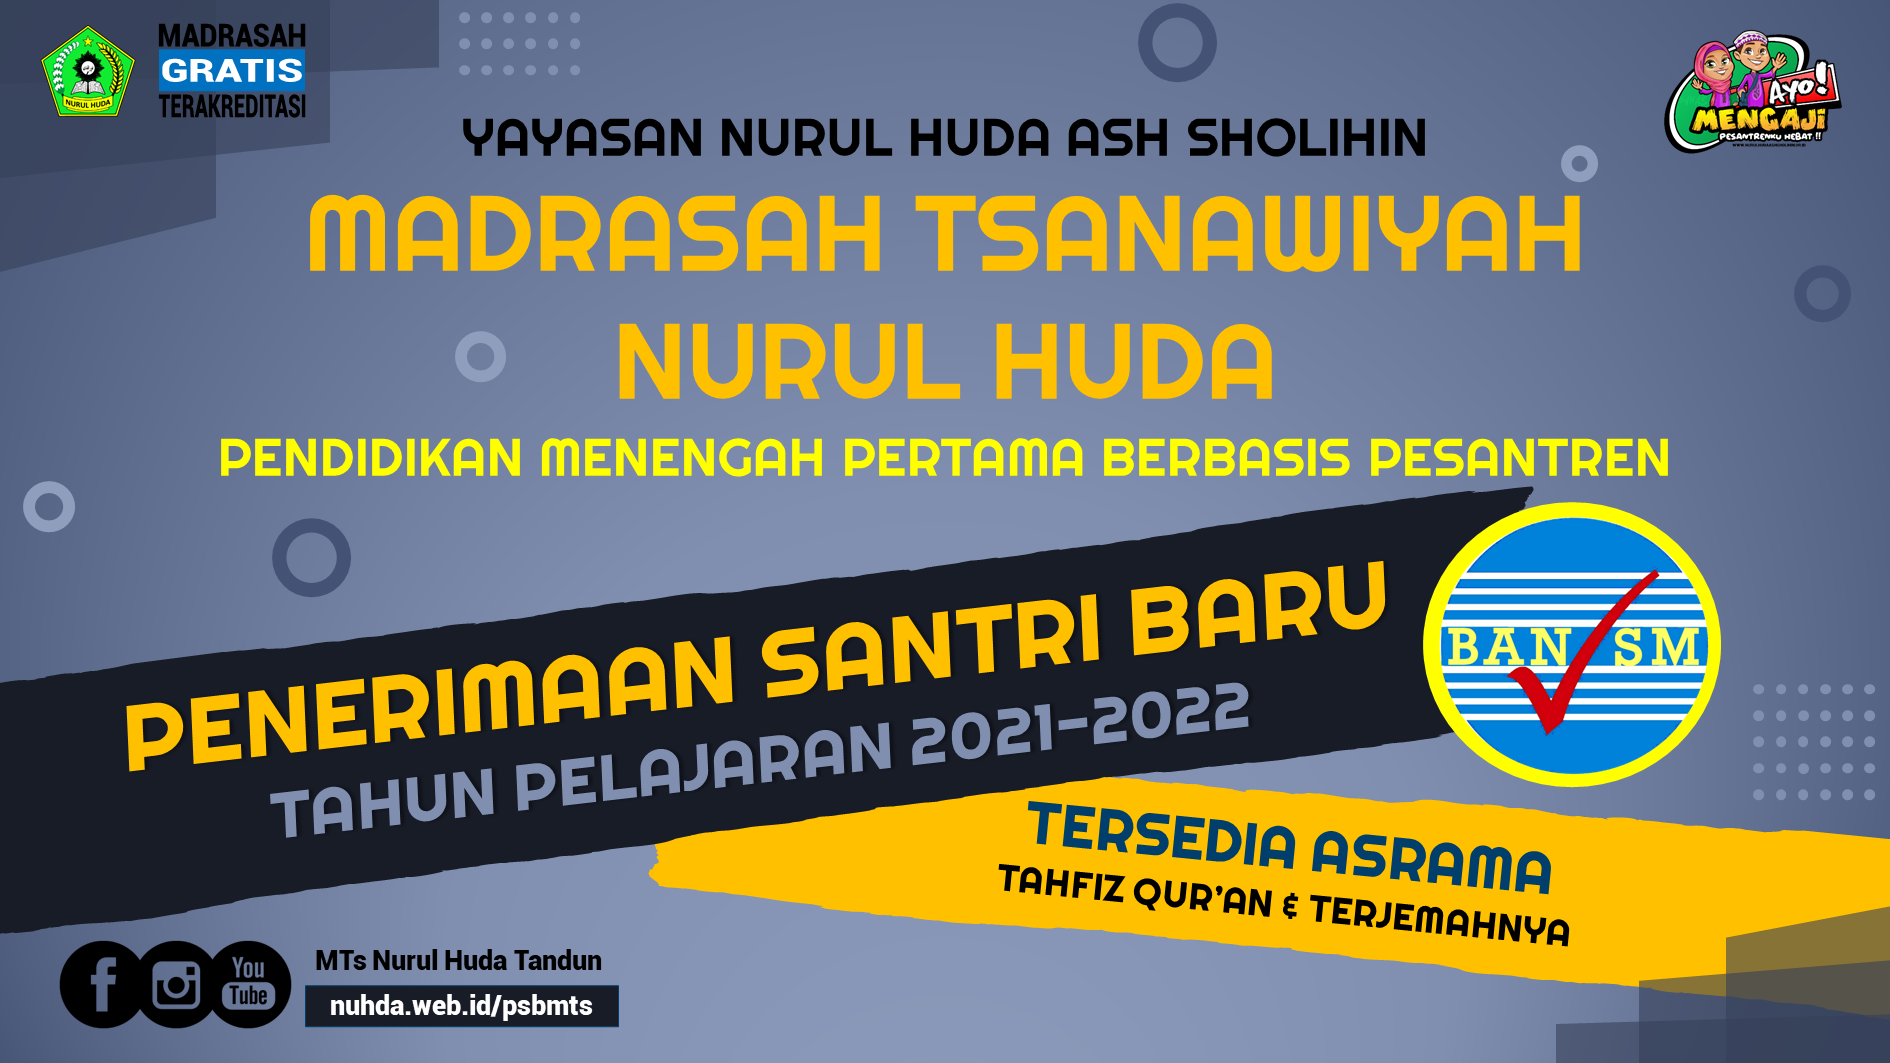 Pendaftaran Siswa Santri Baru MTs Nurul Huda 2021-2022